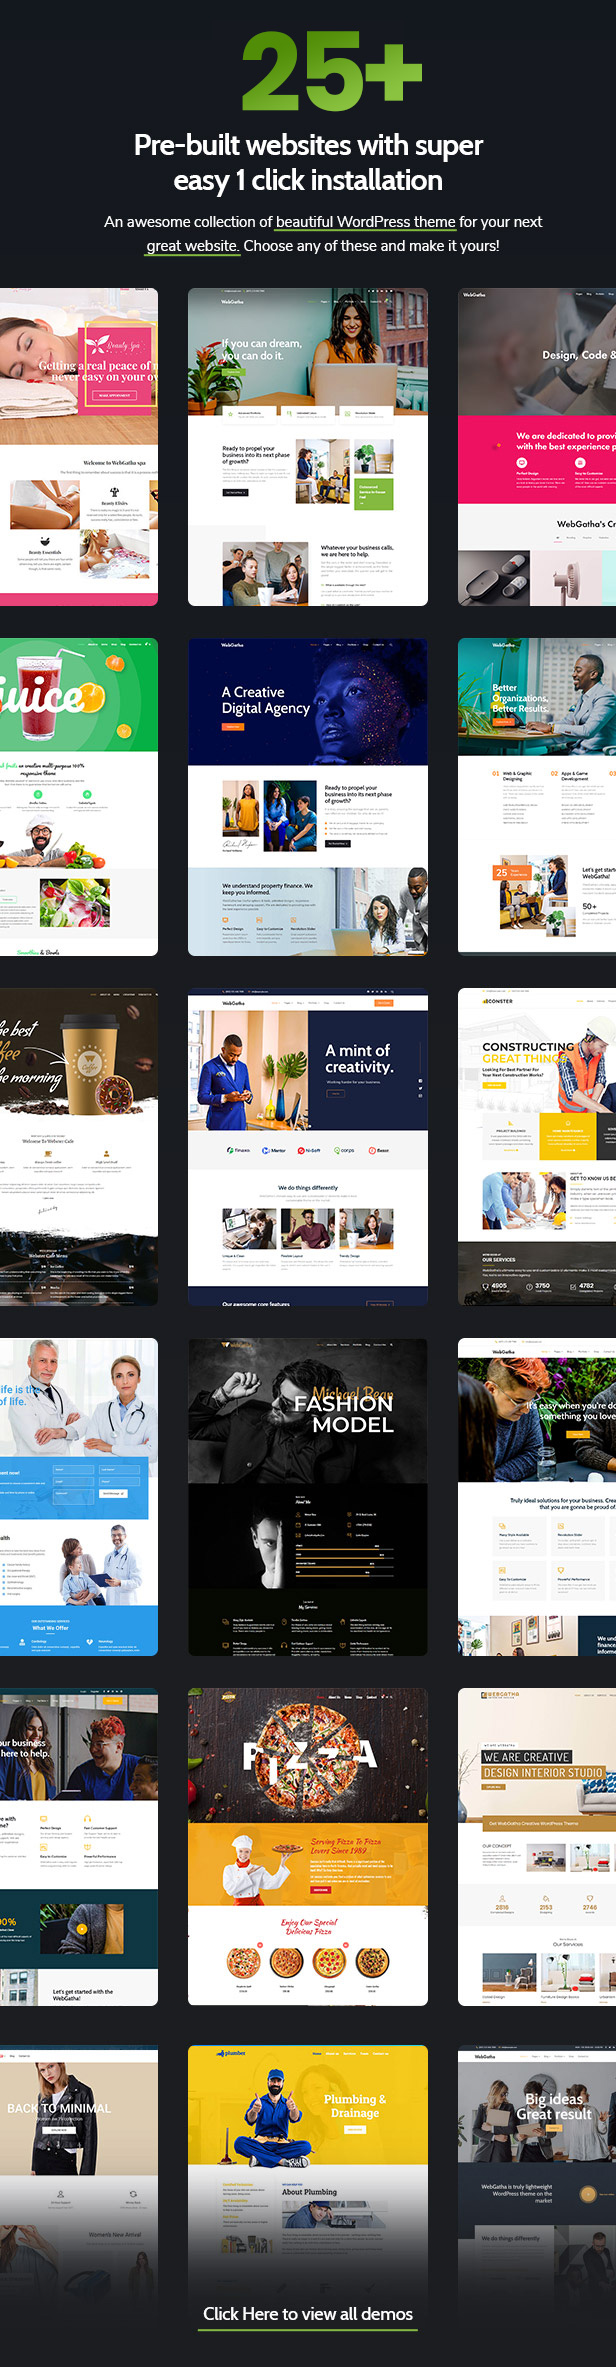 WebGatha - Multi-purpose WordPress Theme - 3